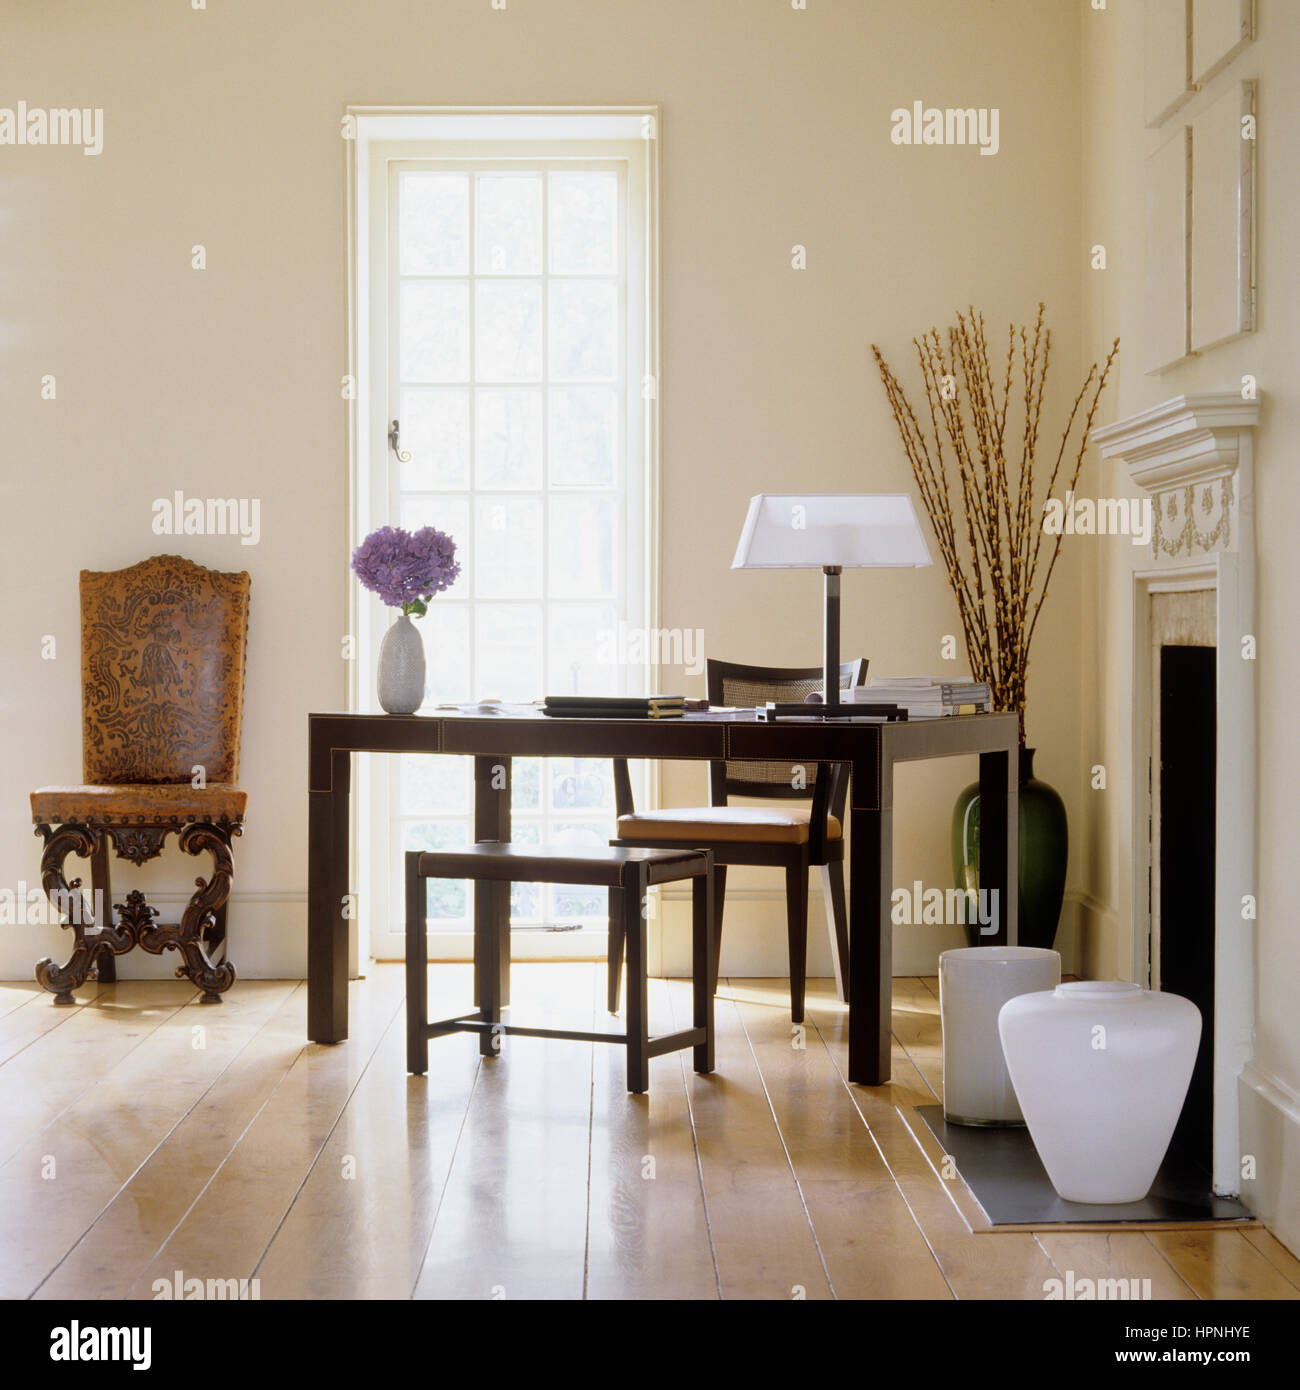 A study by a fireplace. - Stock Image